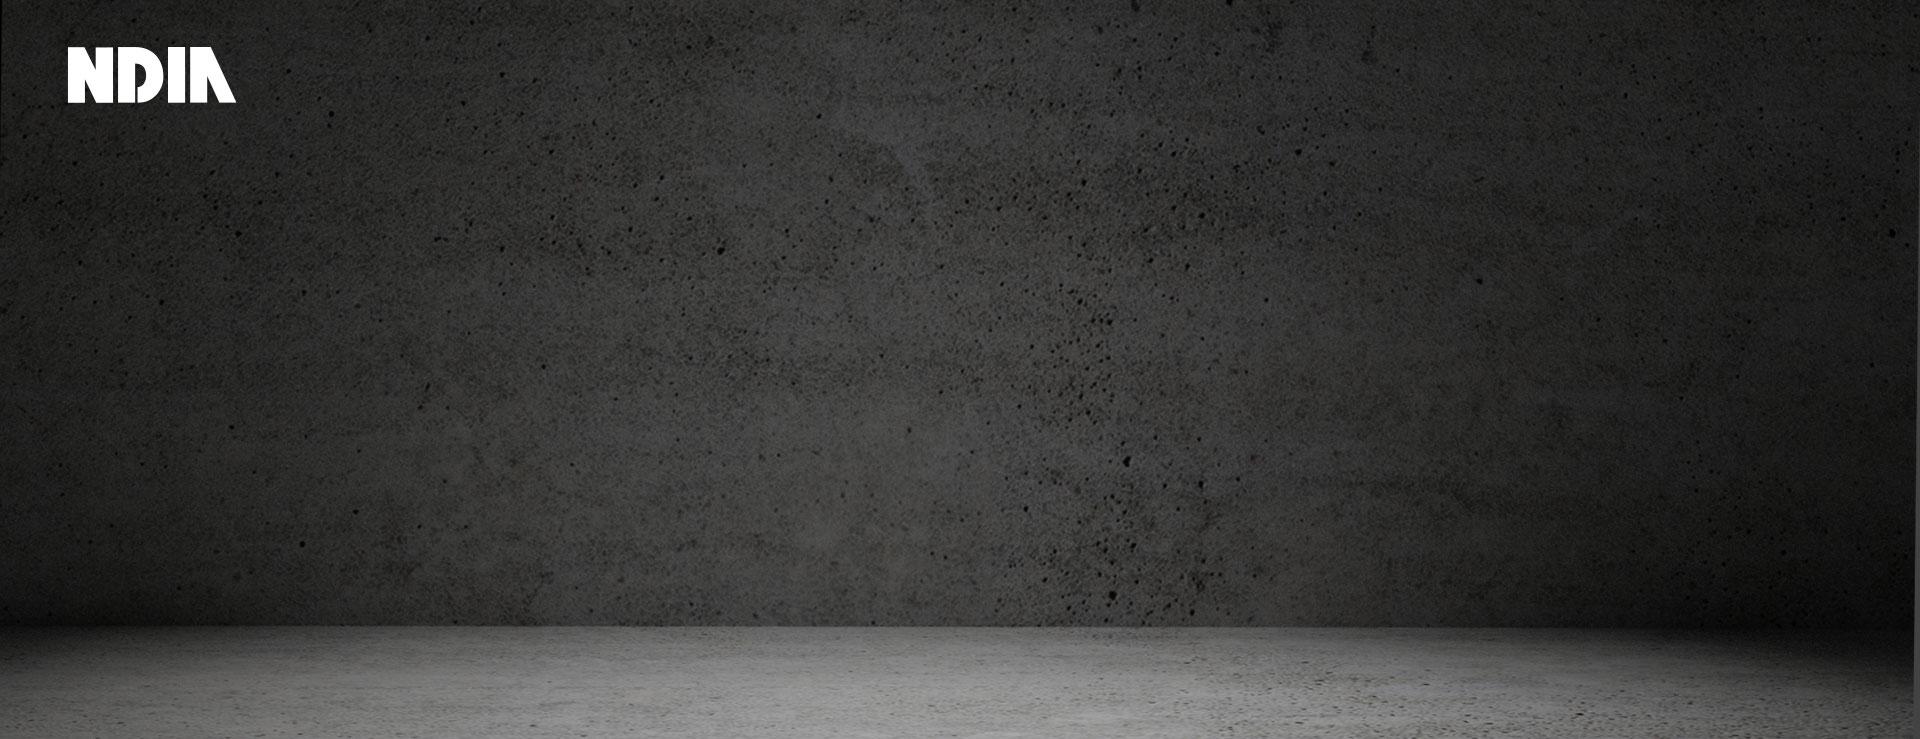 Dark background with the NDIA logo in the corner.